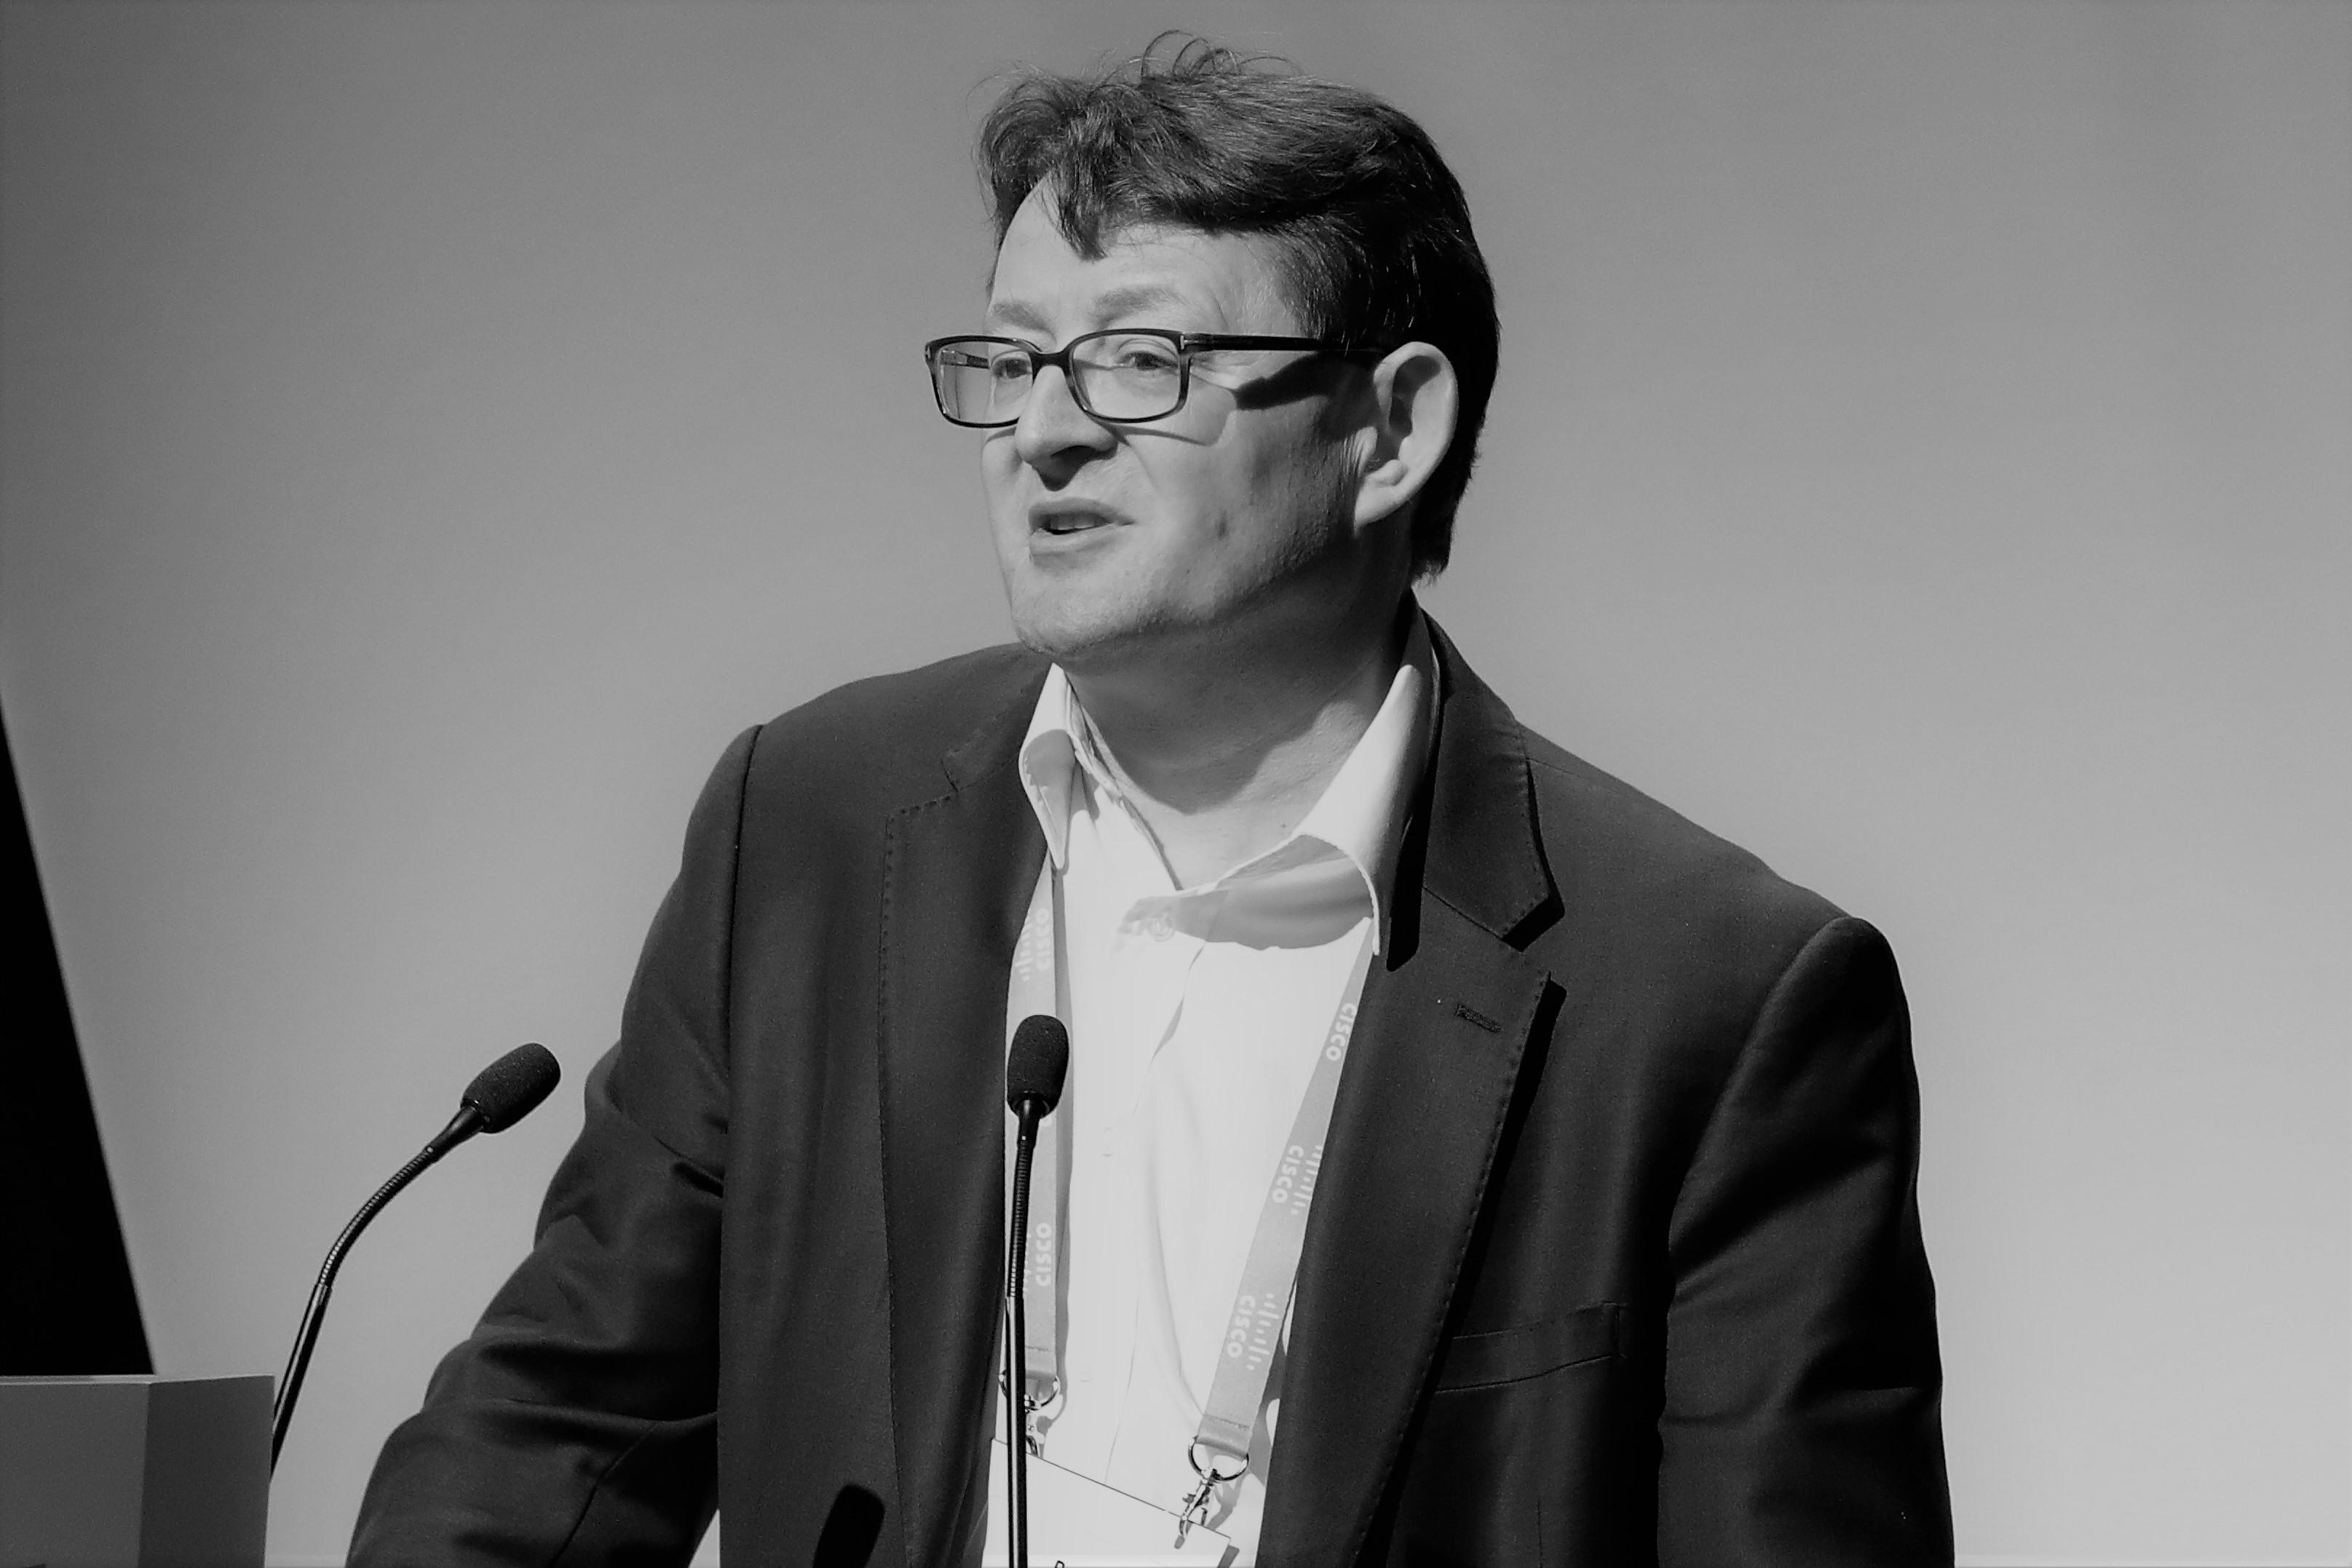 Patrick Donegan, Principal Analyst